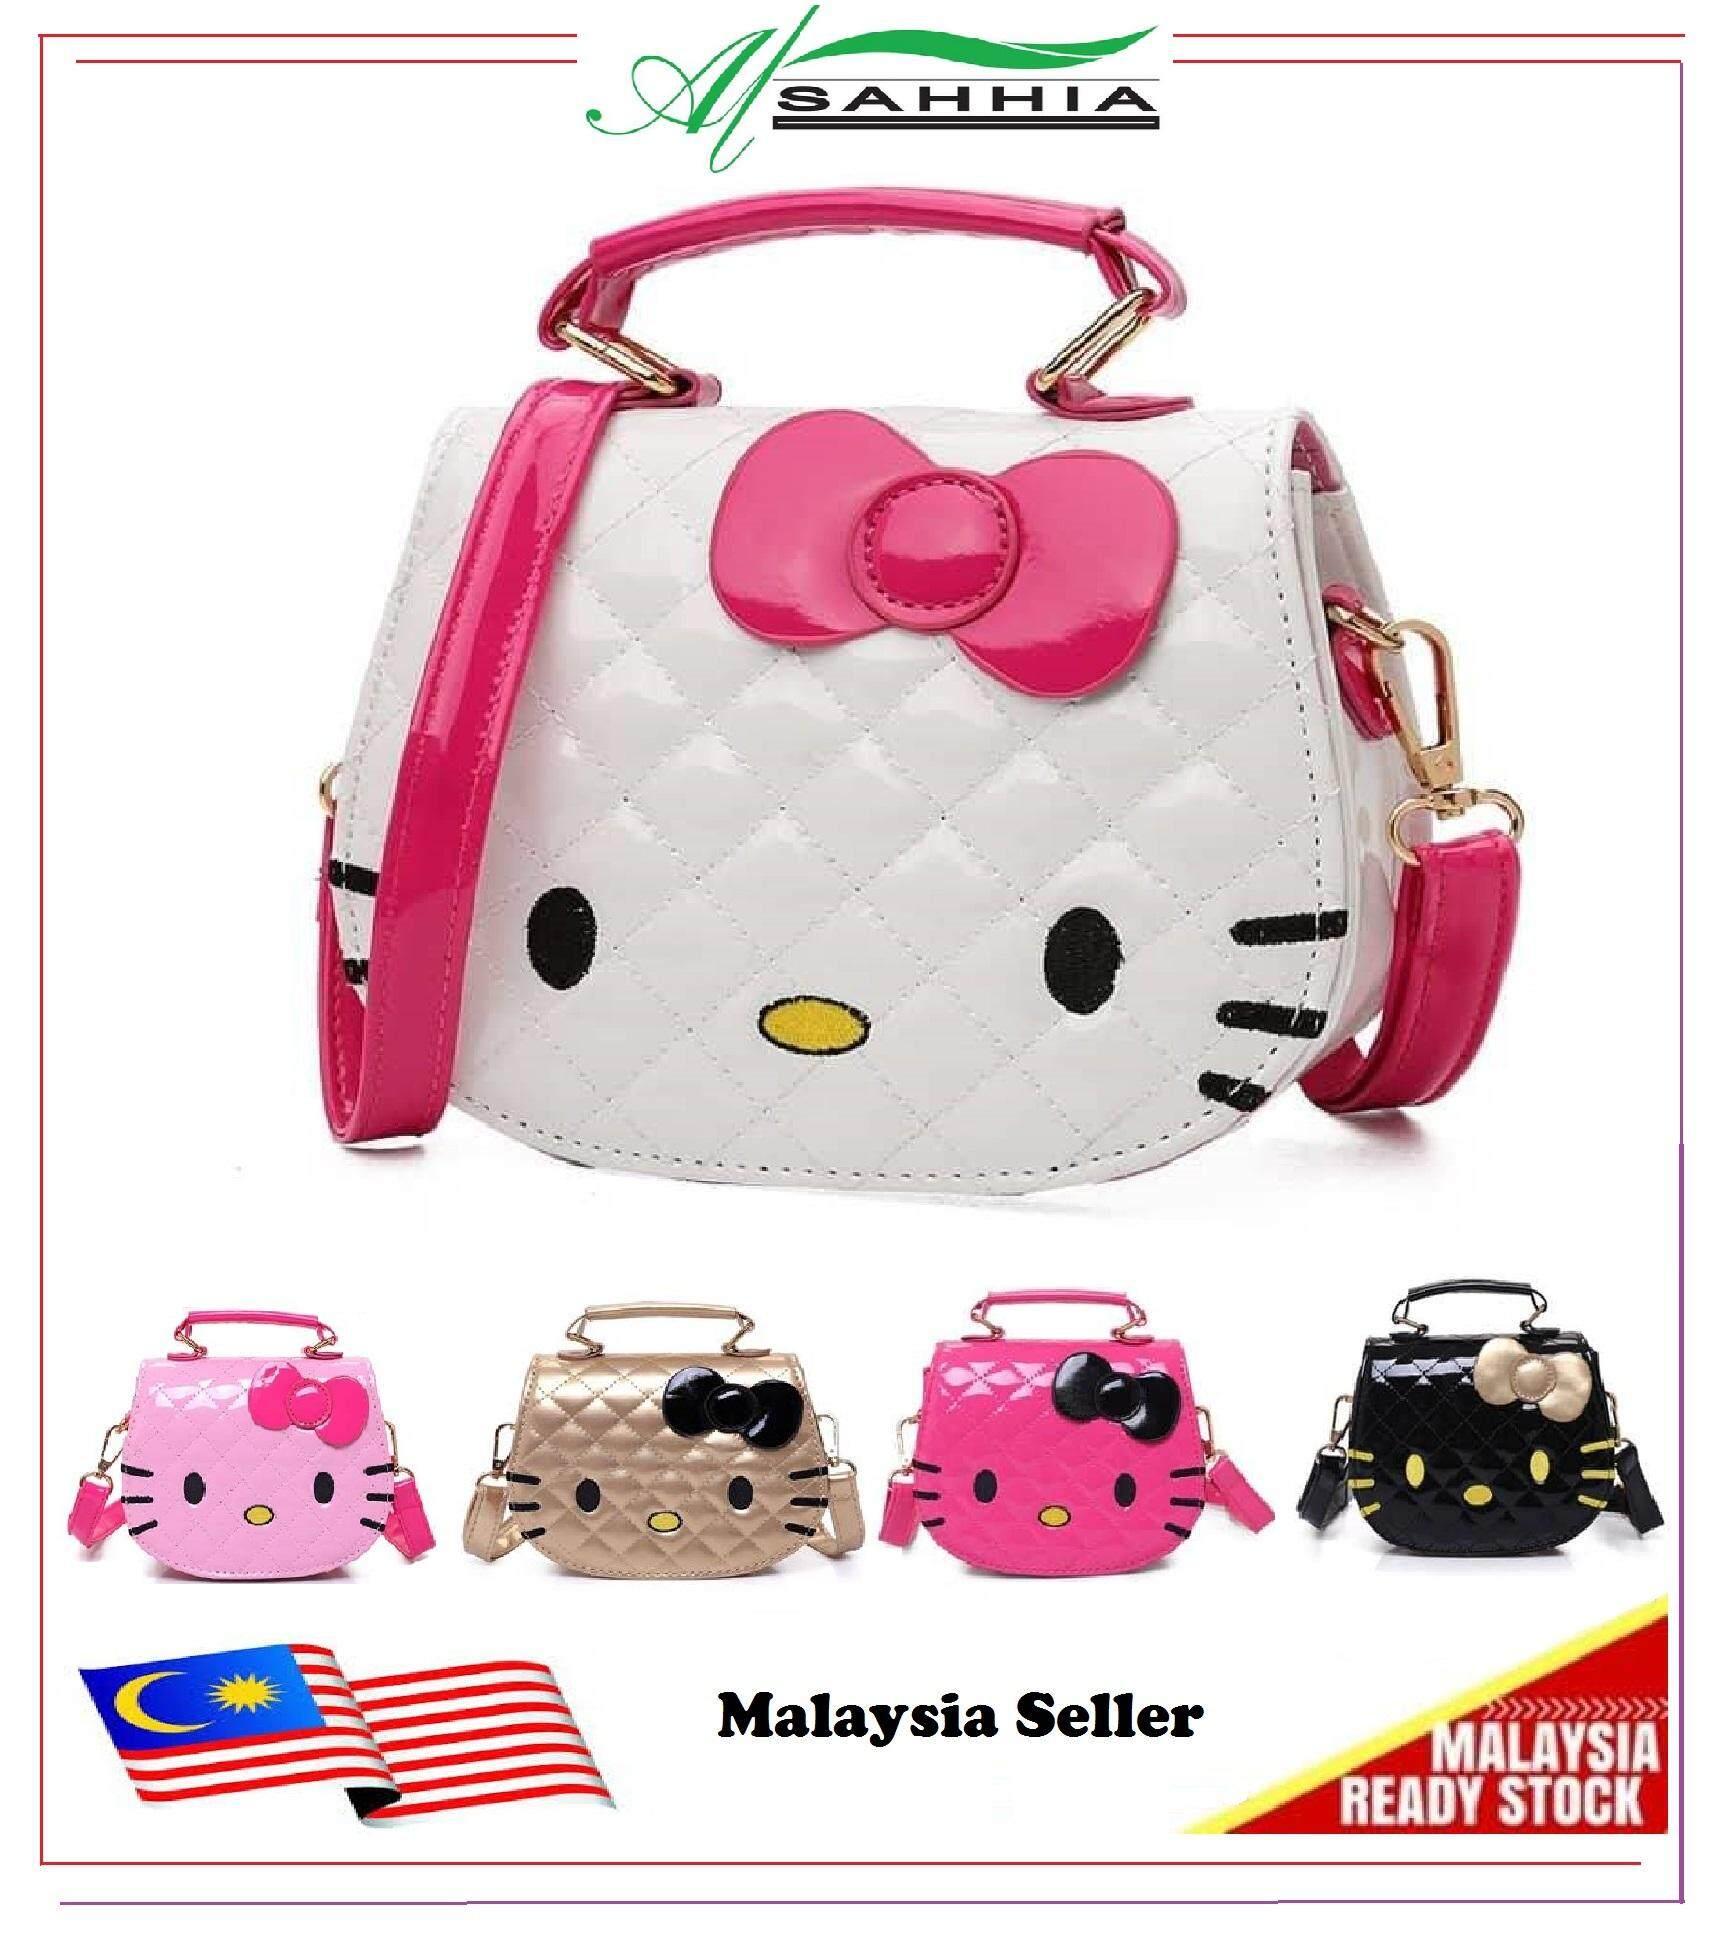 37c861ee44 Al Sahhia Ready Stock Kawaii Cute Pretty Bow Hello Kitty PU Handbag Kid  Girls Bag Sling